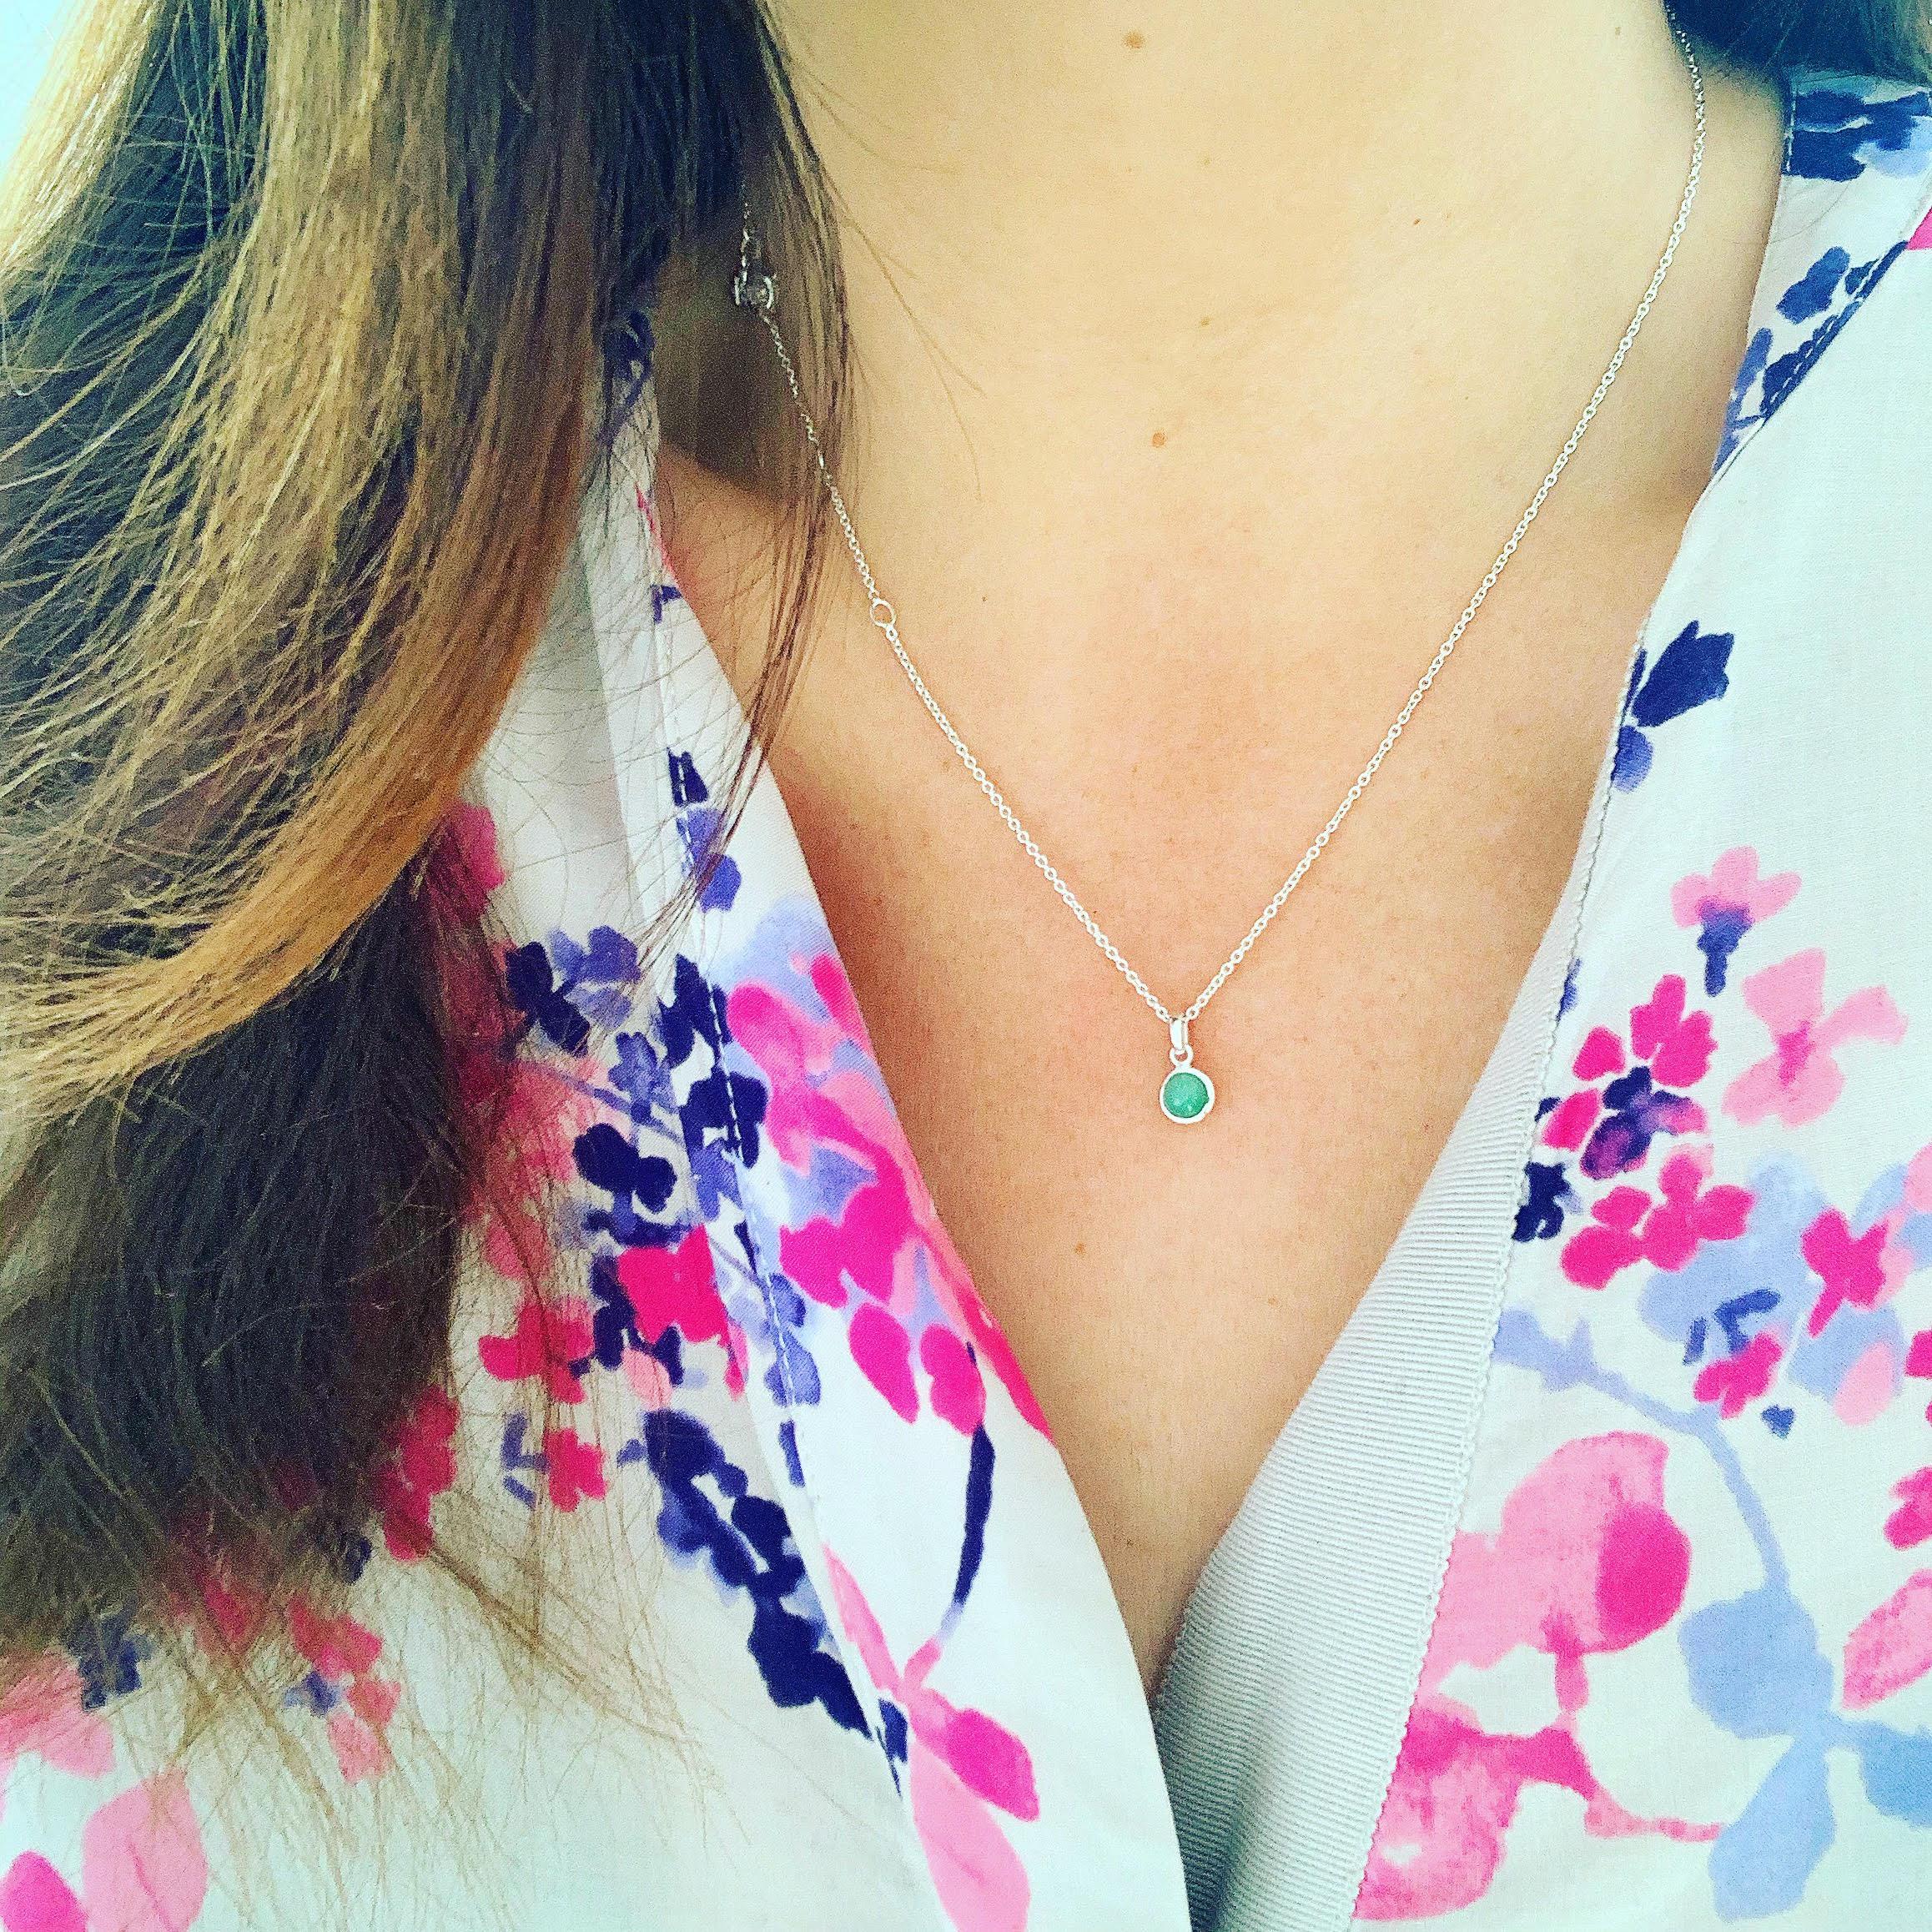 Birthstone necklace.